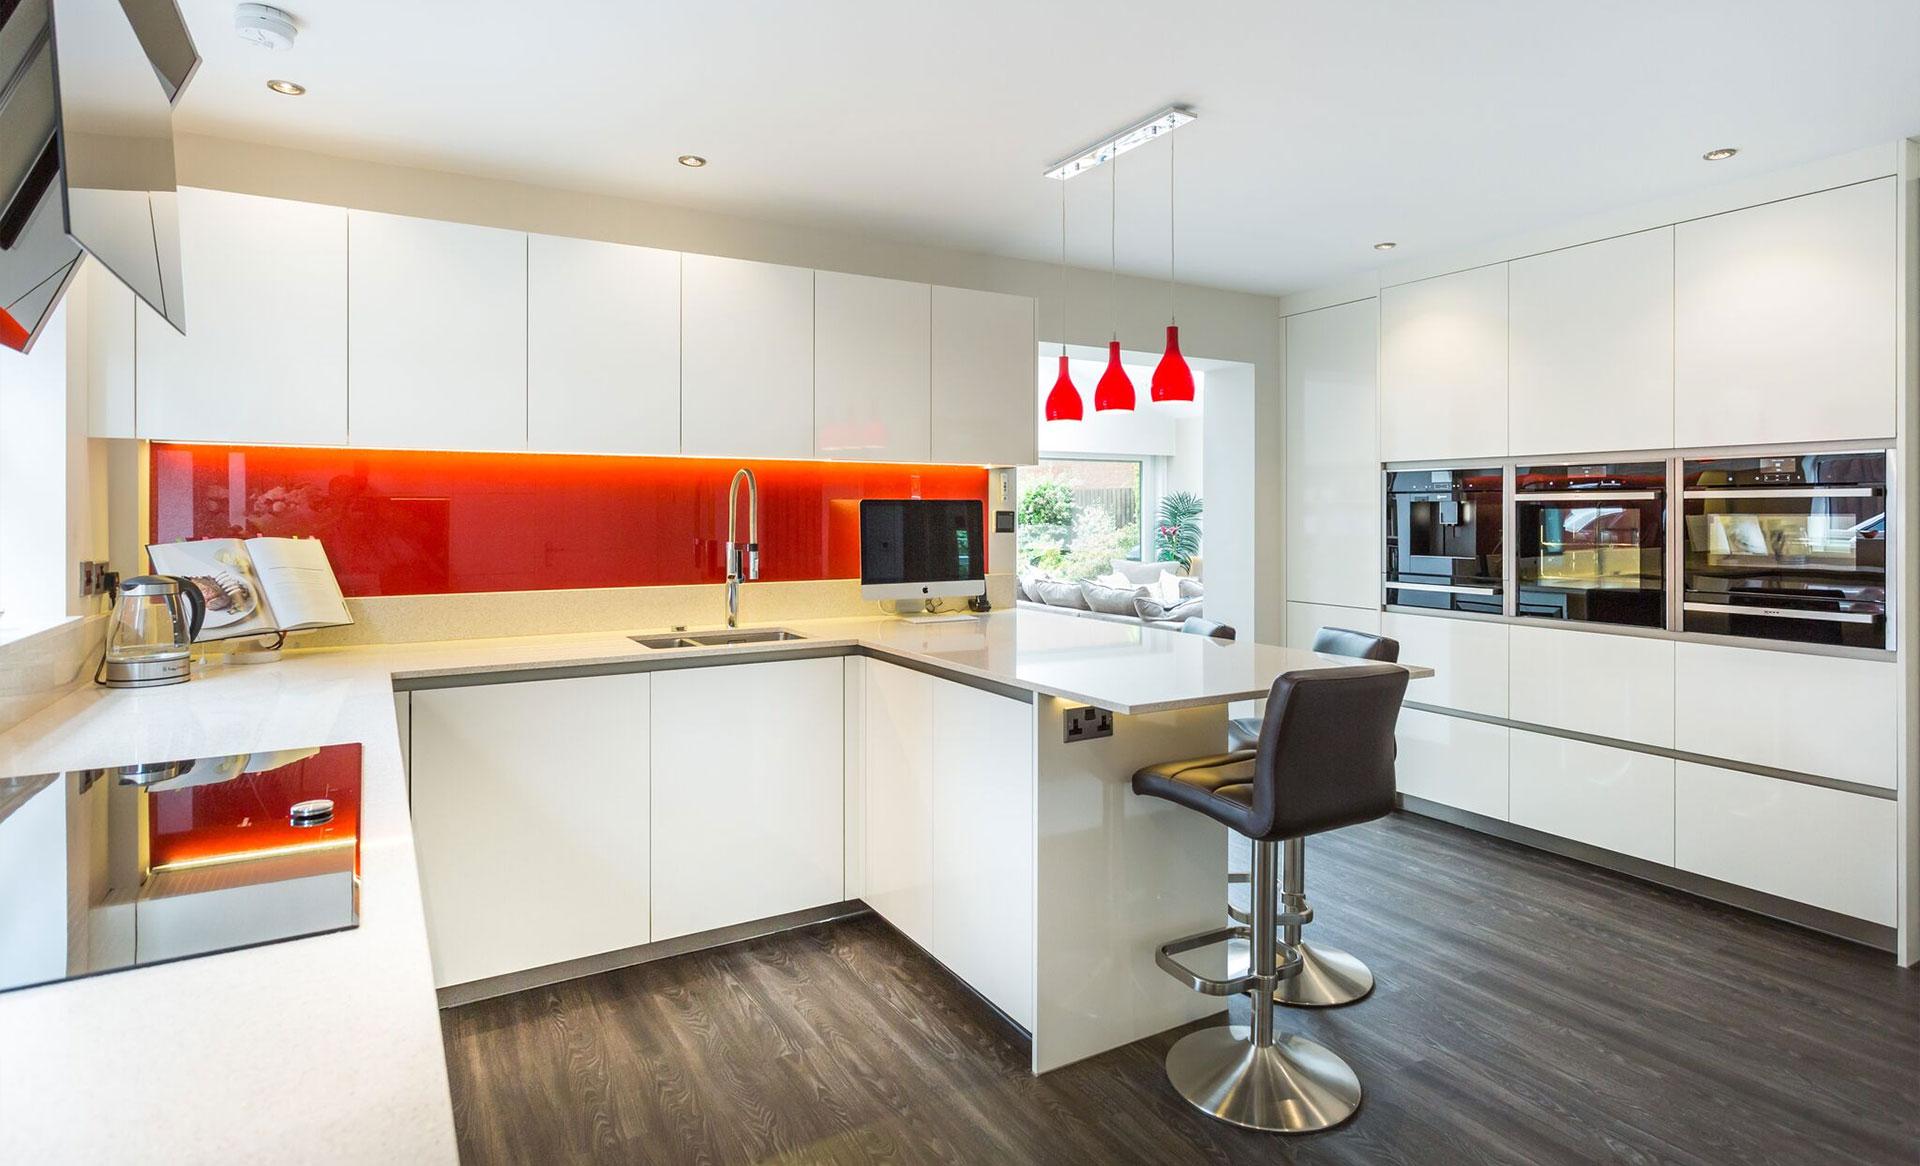 Designer Kitchens Clitheroe Award Winning Rational